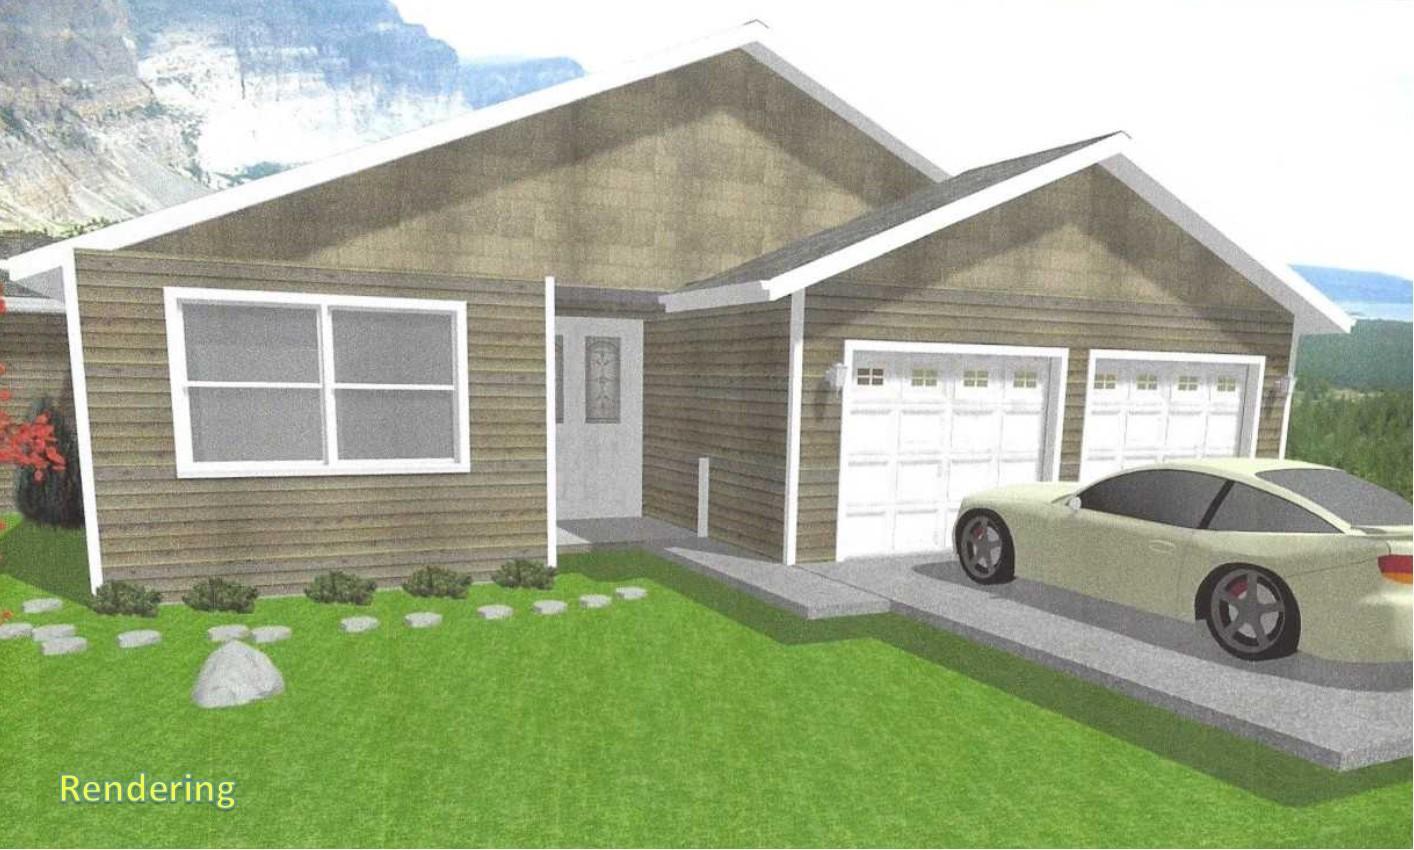 605 Hidden Valley Circle, Buffalo, Wyoming 82834, 4 Bedrooms Bedrooms, ,2.5 BathroomsBathrooms,Residential,For Sale,Hidden Valley,18-553